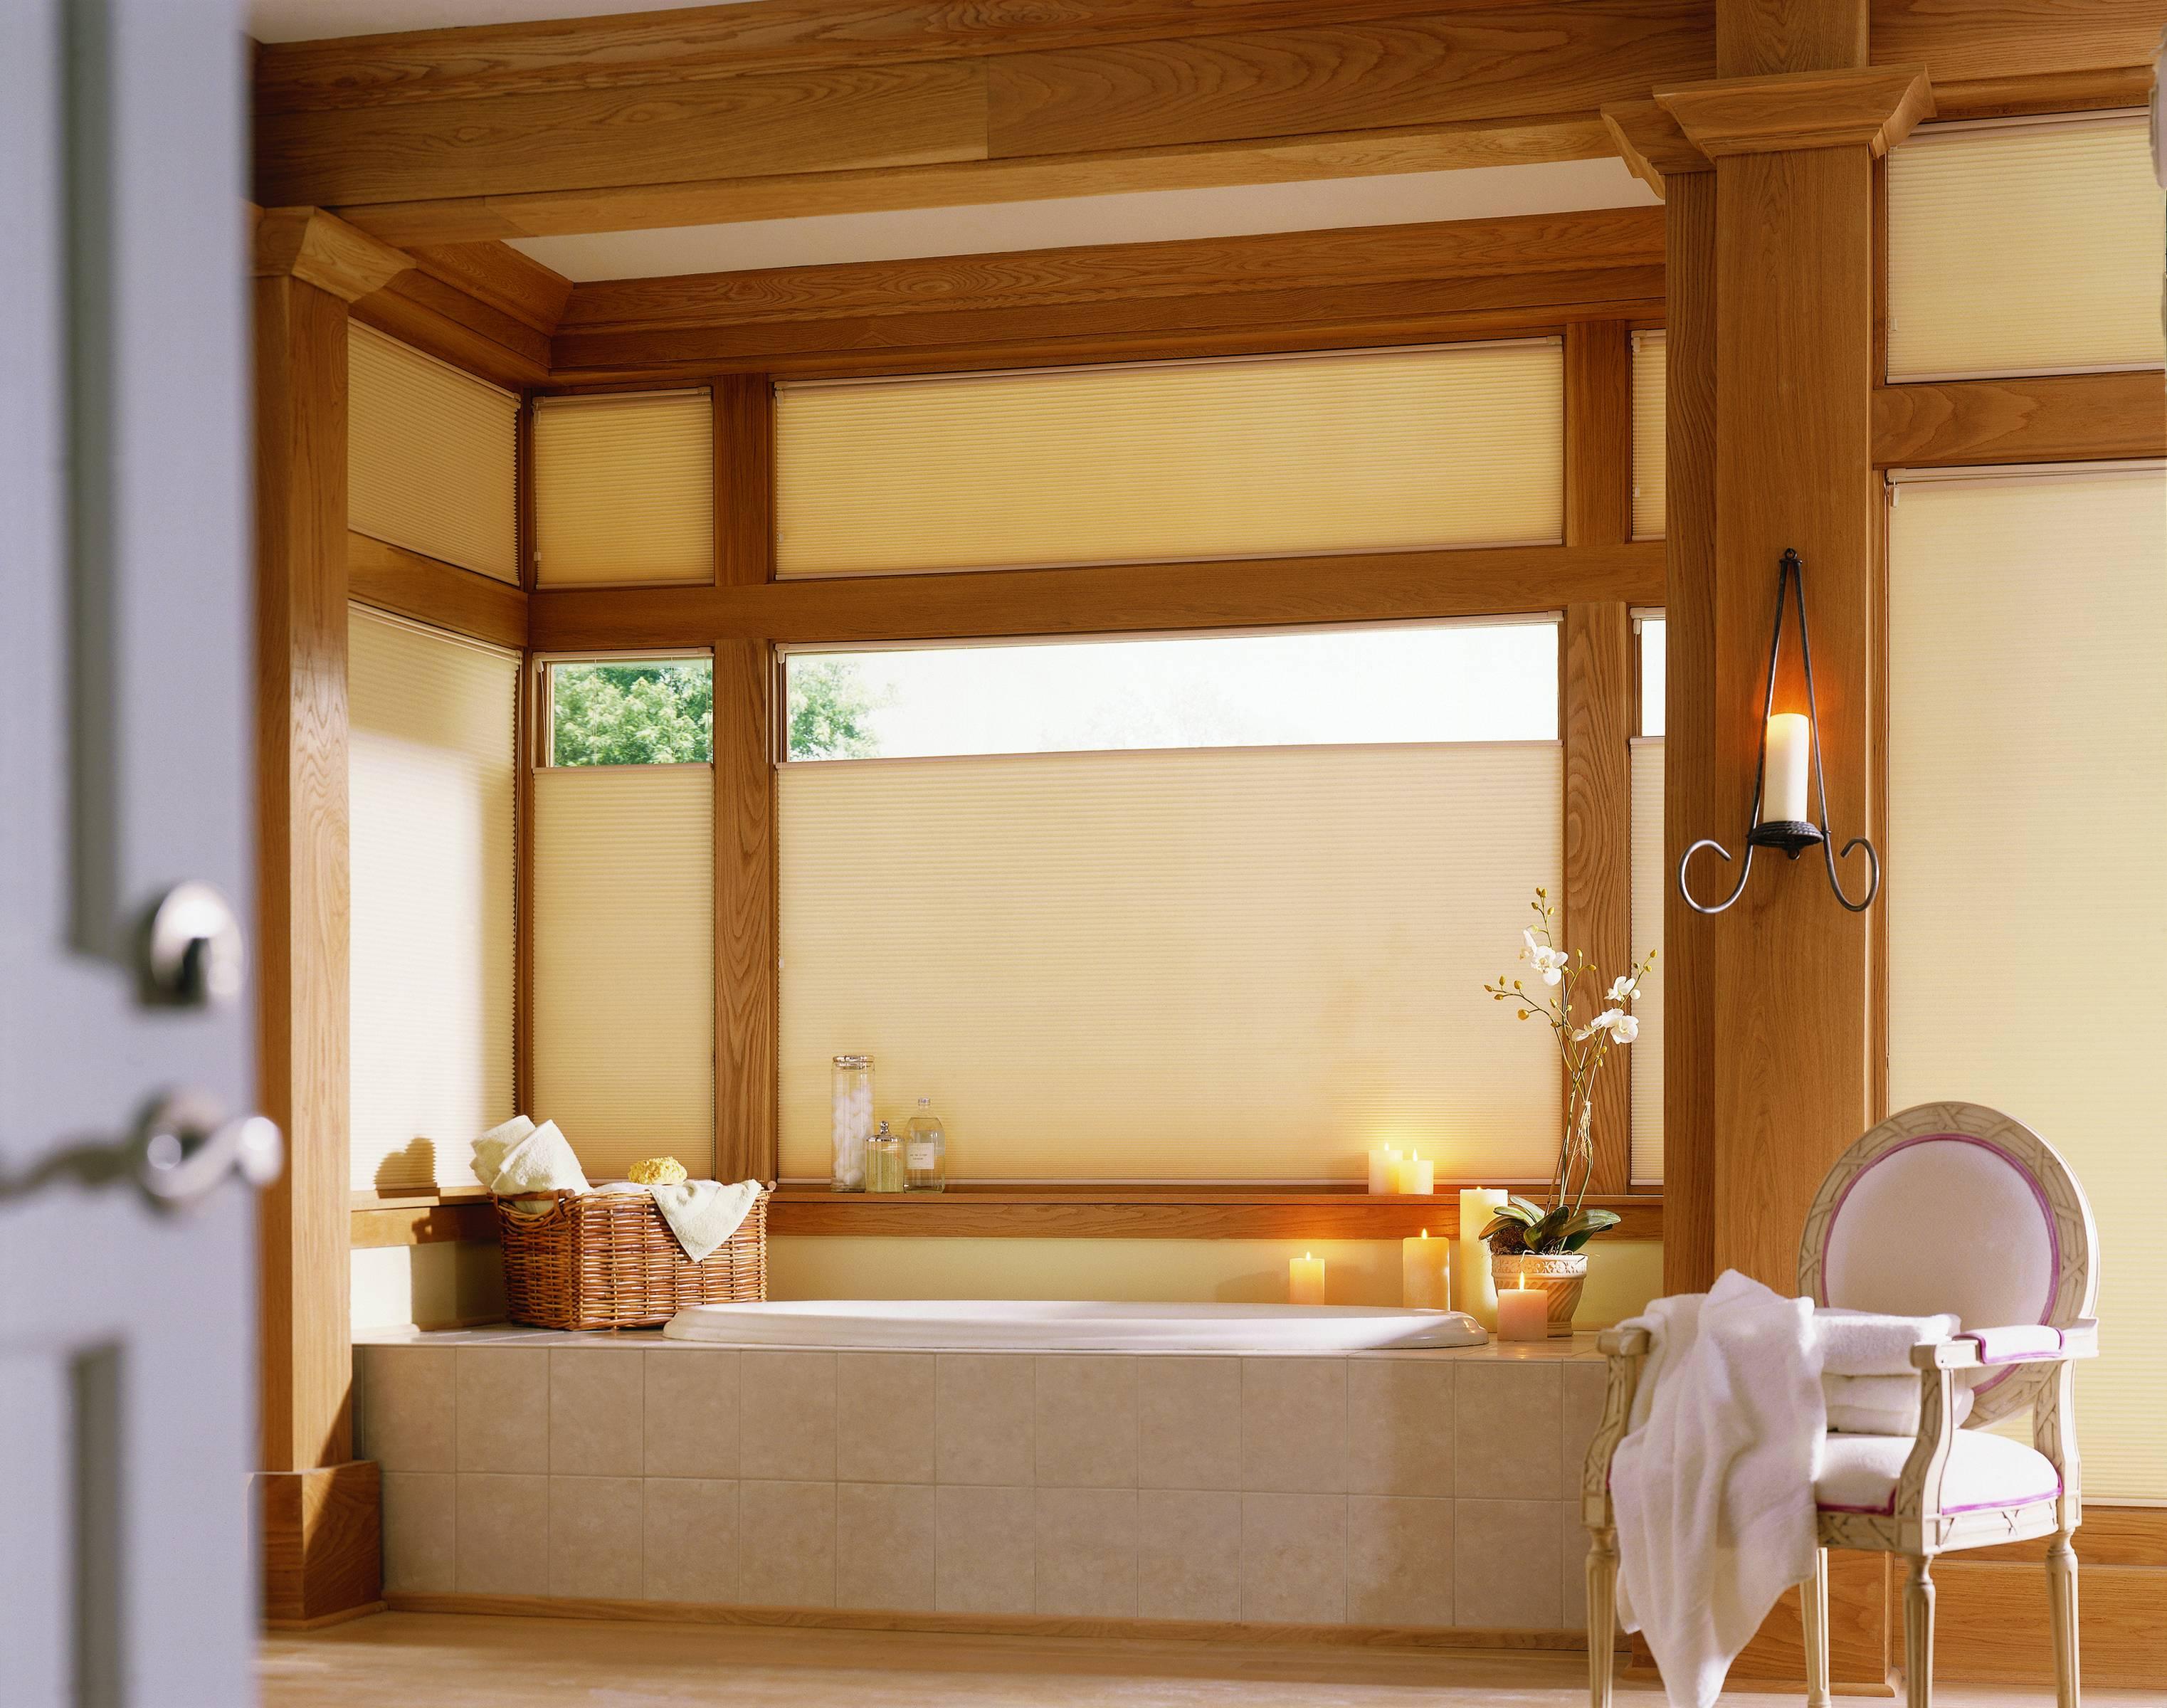 comfortex-cellular-bathroom